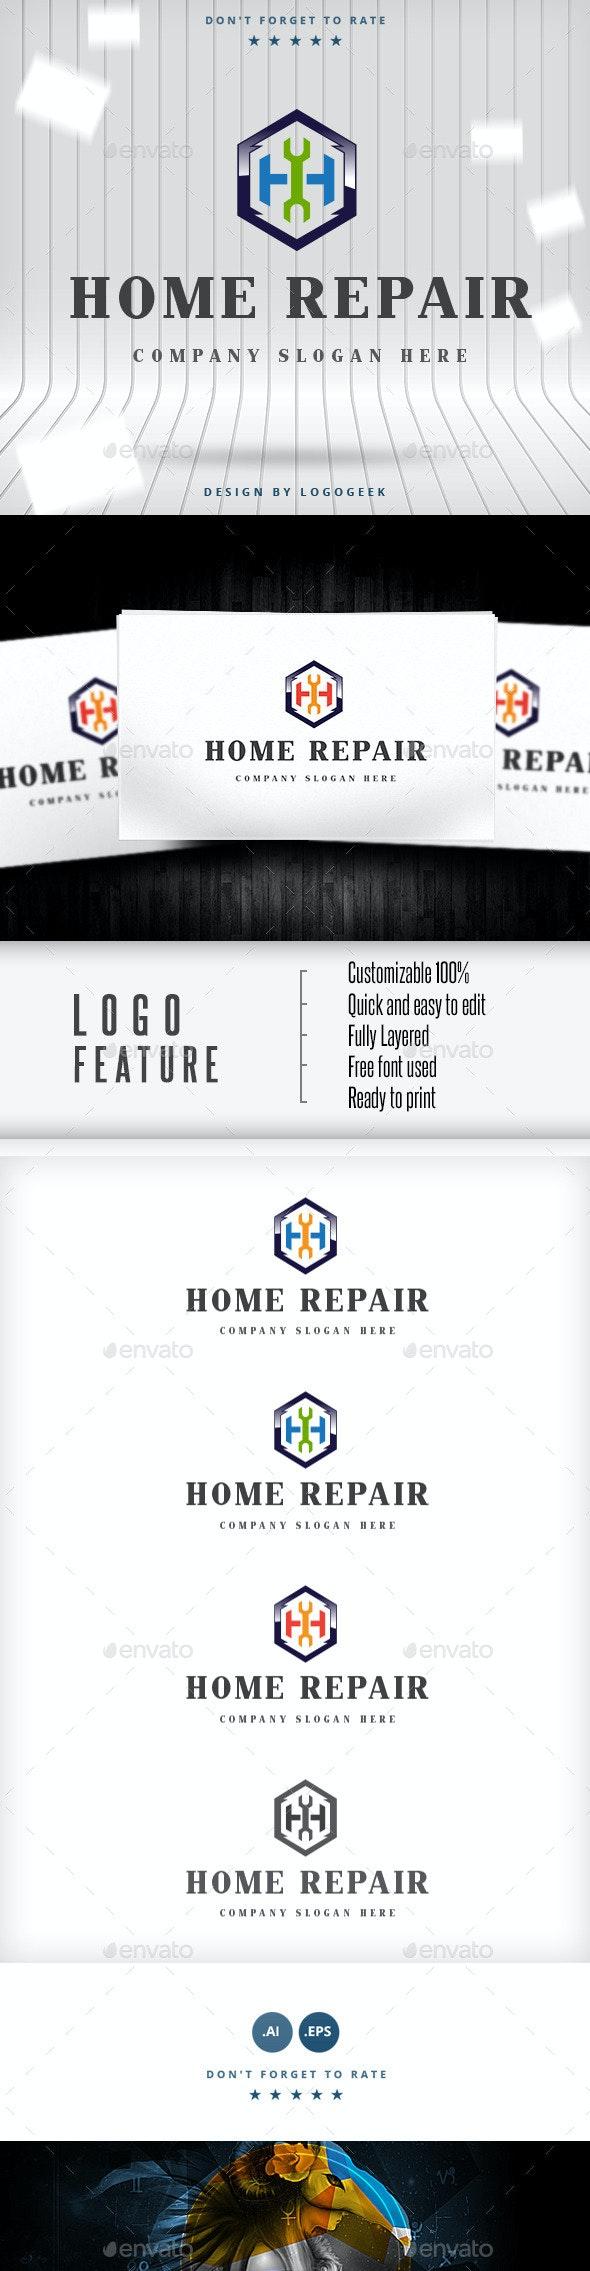 Home Repair V.2 - Buildings Logo Templates